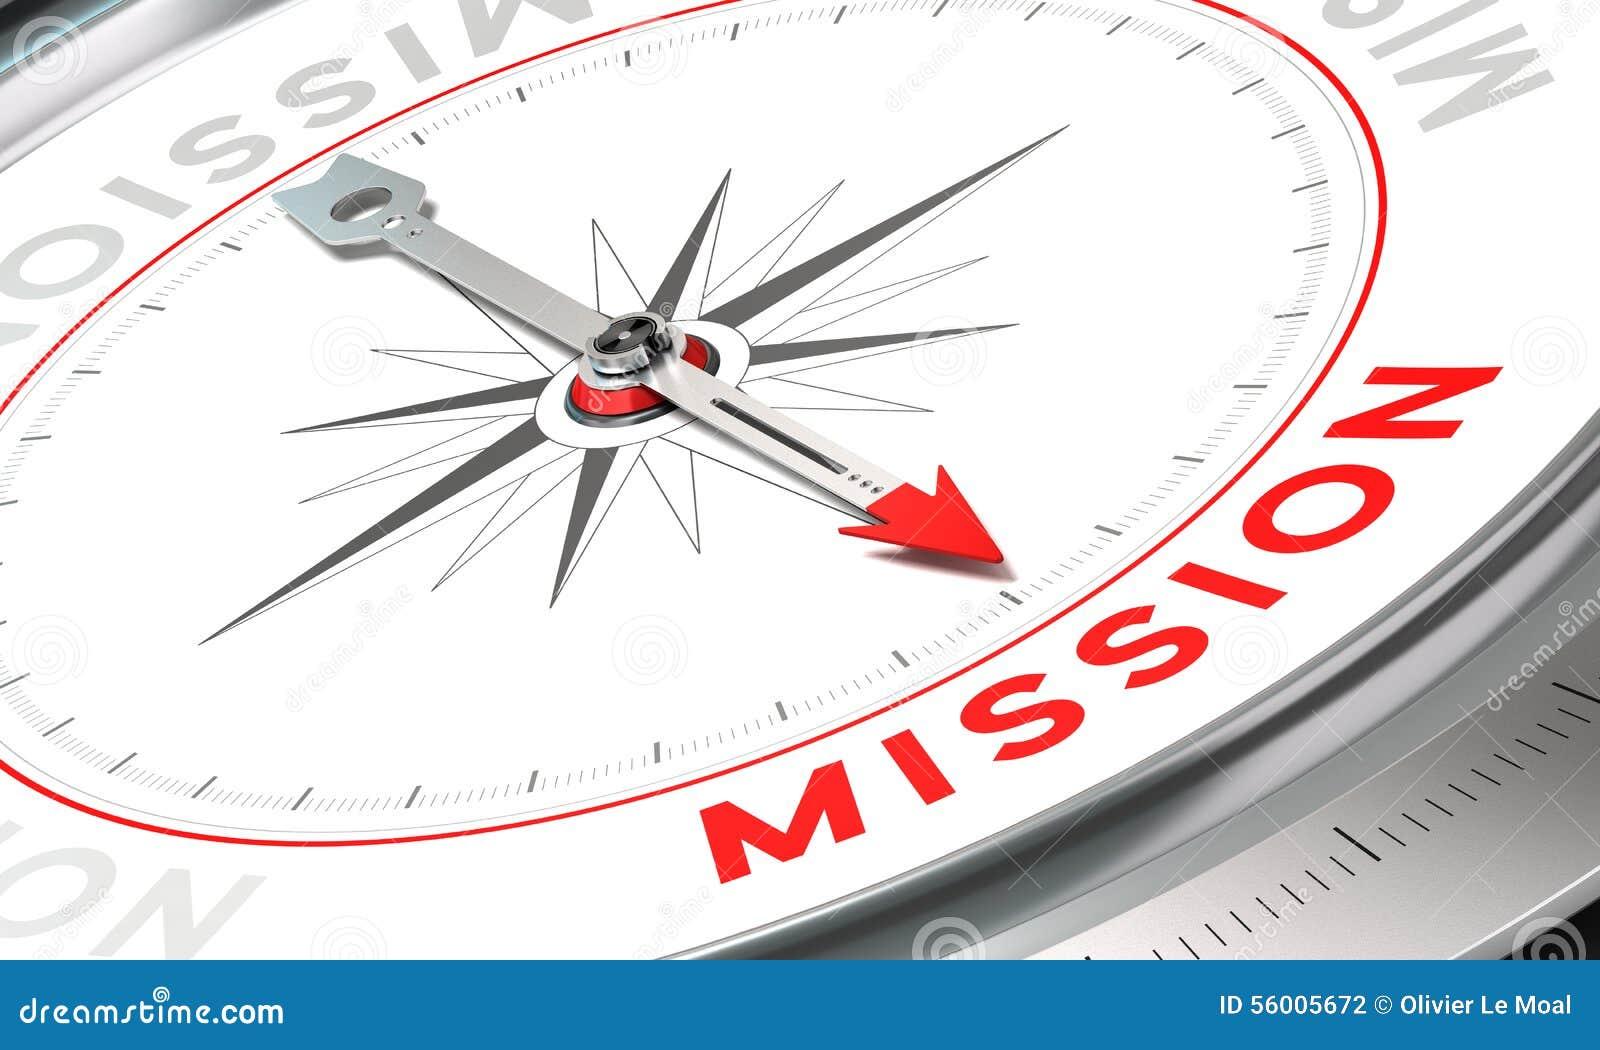 Company Statement, Mission